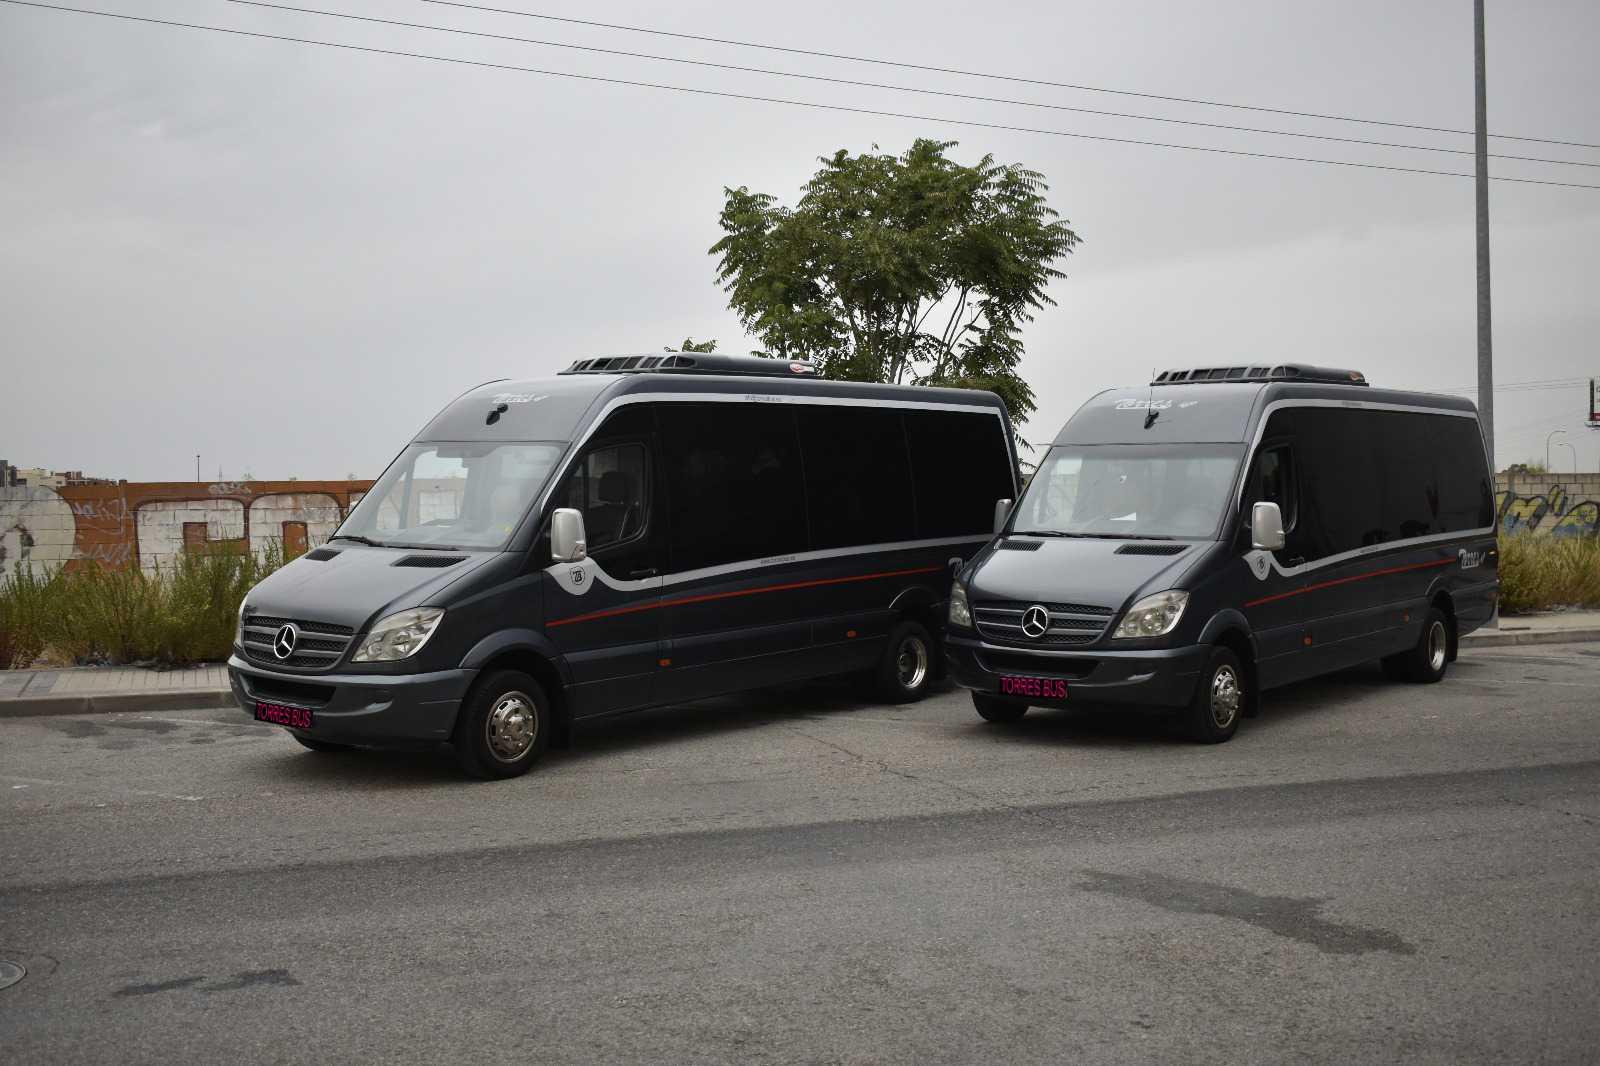 Alquiler de autobuses baratos en Madrid – Empresa Torres Bus